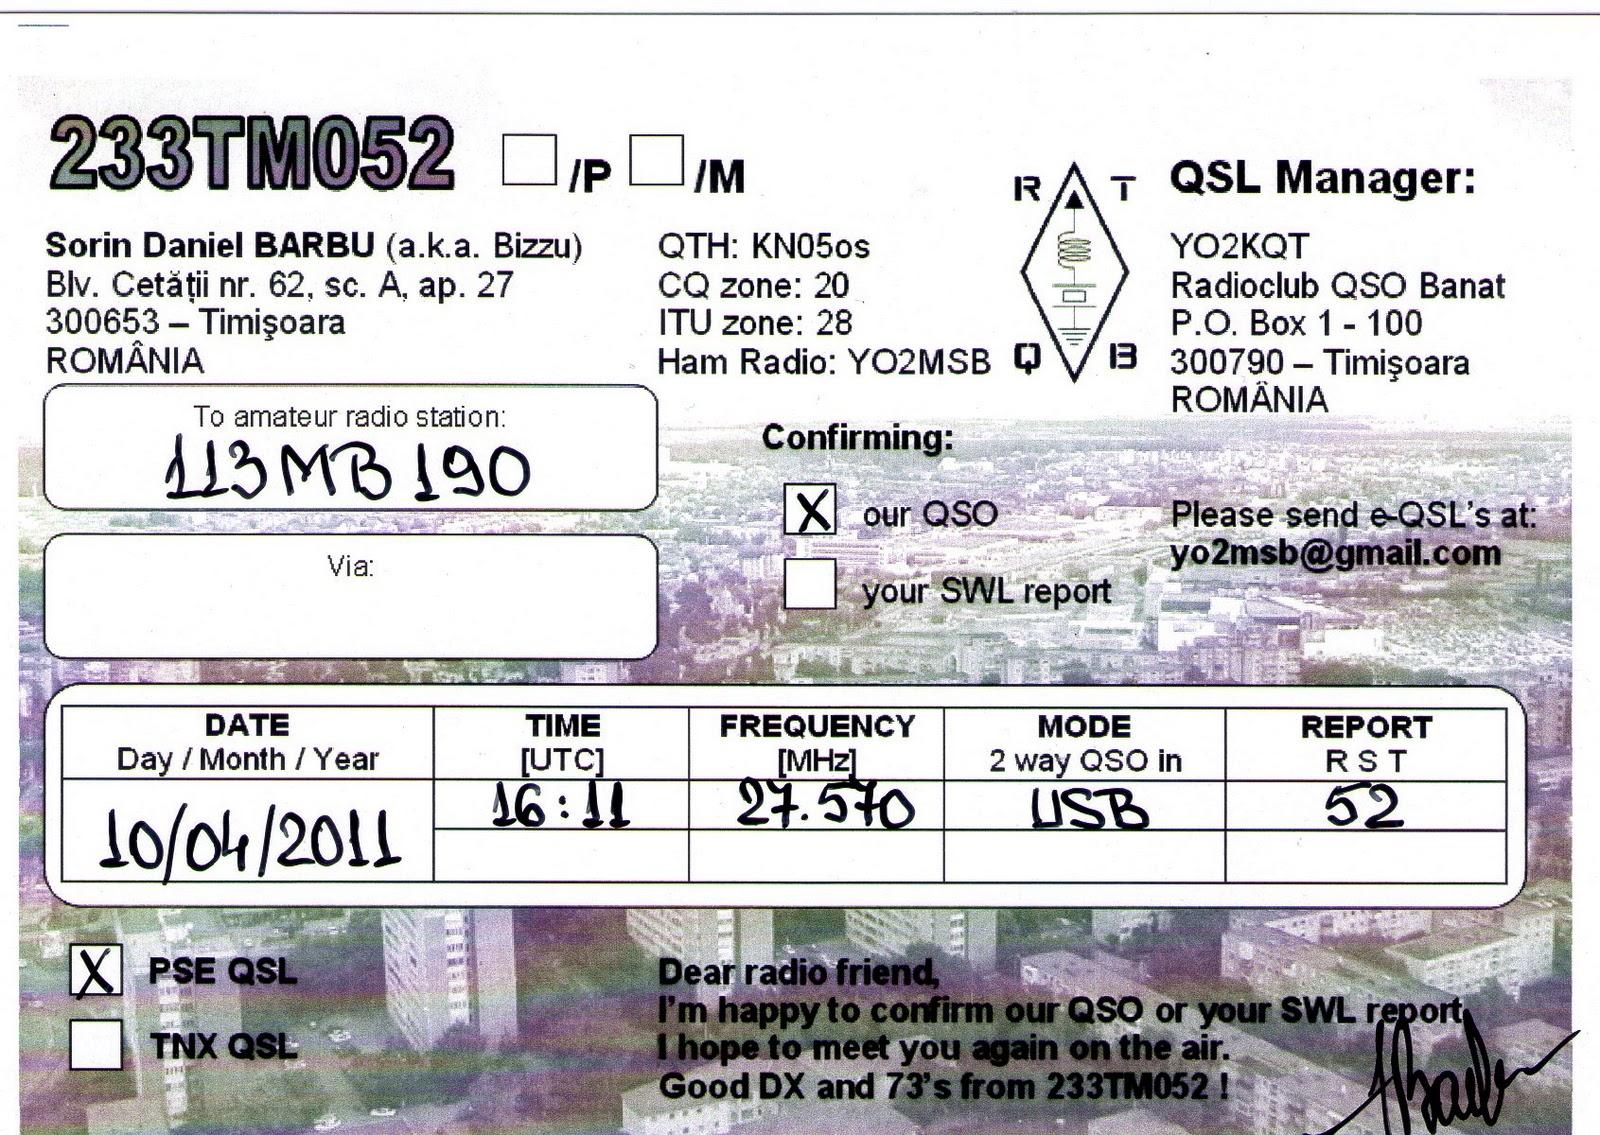 113MB190 11M Band Web Blog: September 2011